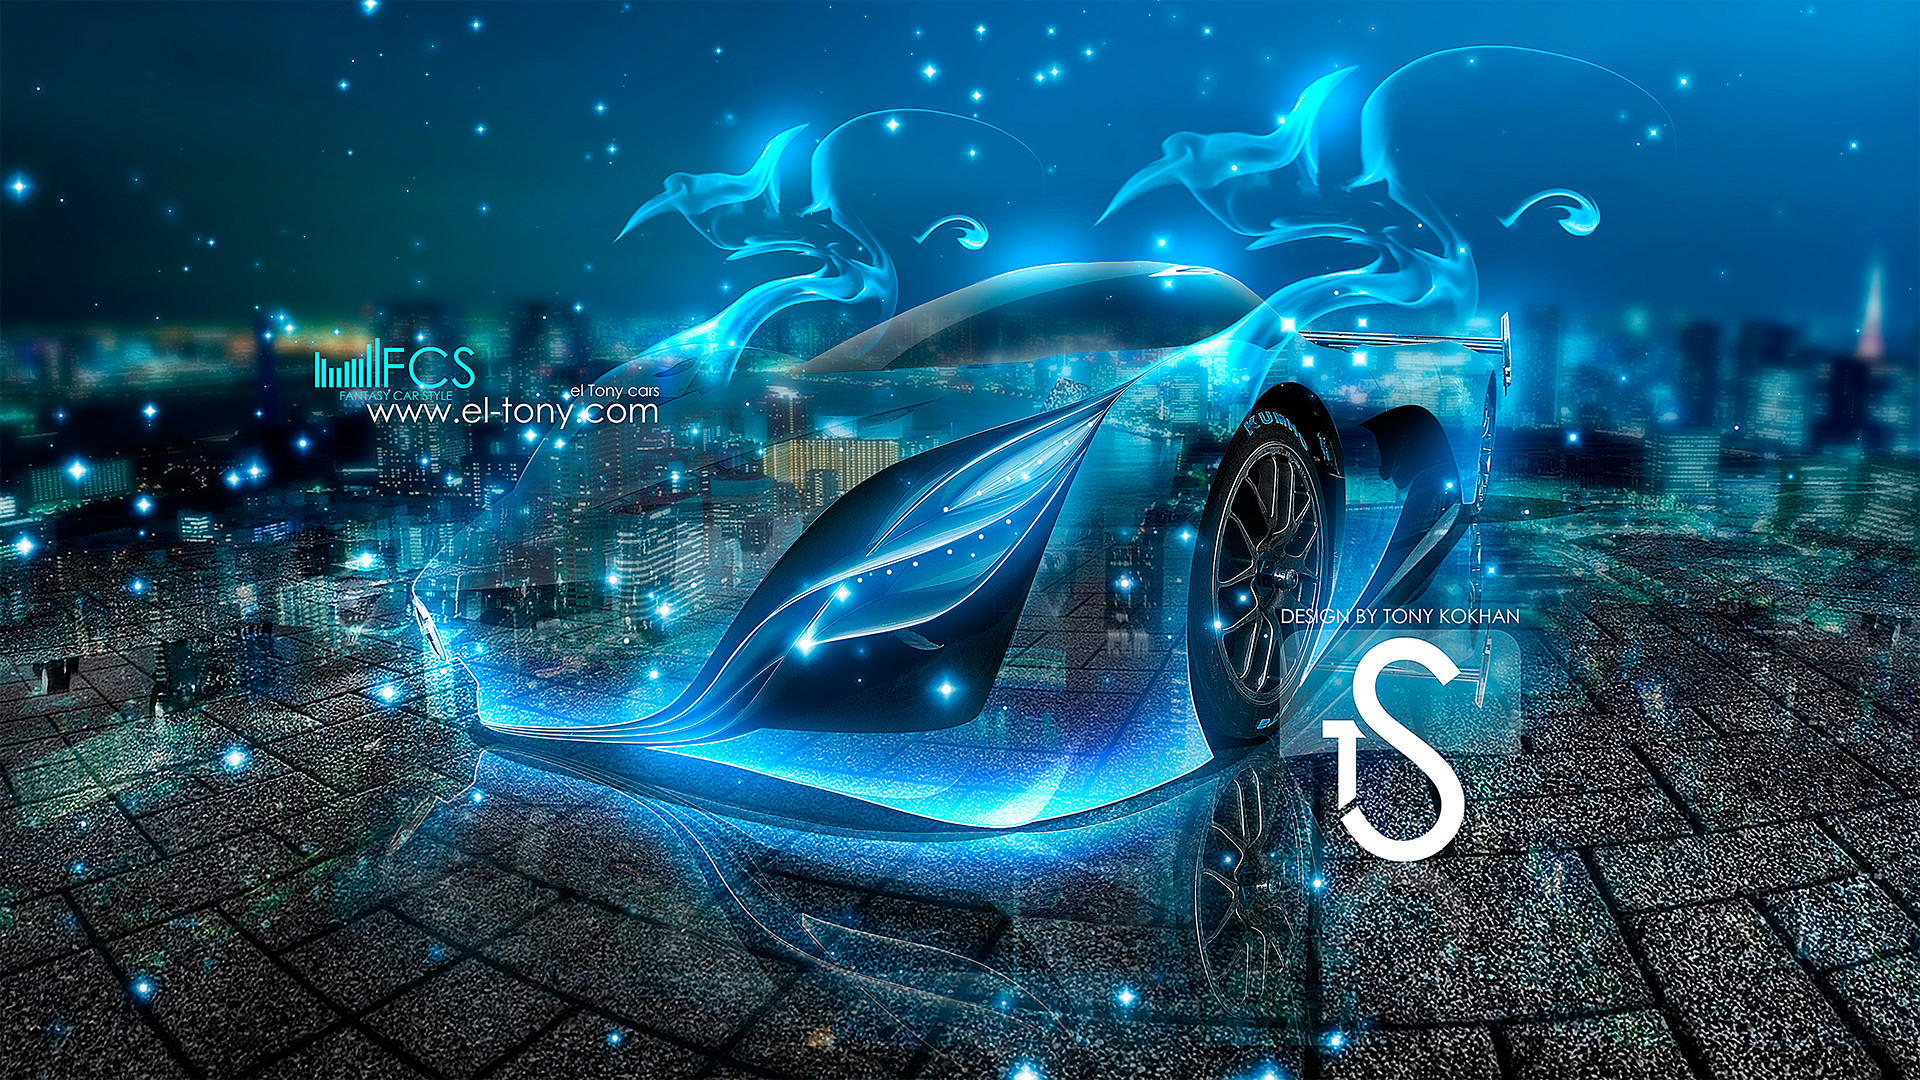 Mazda-Furai-Fantasy-Blue-Fire-Crystal-Car-2013-HD-Wallpapers -design-by-Tony-Kokhan-[www.el-tony.com]